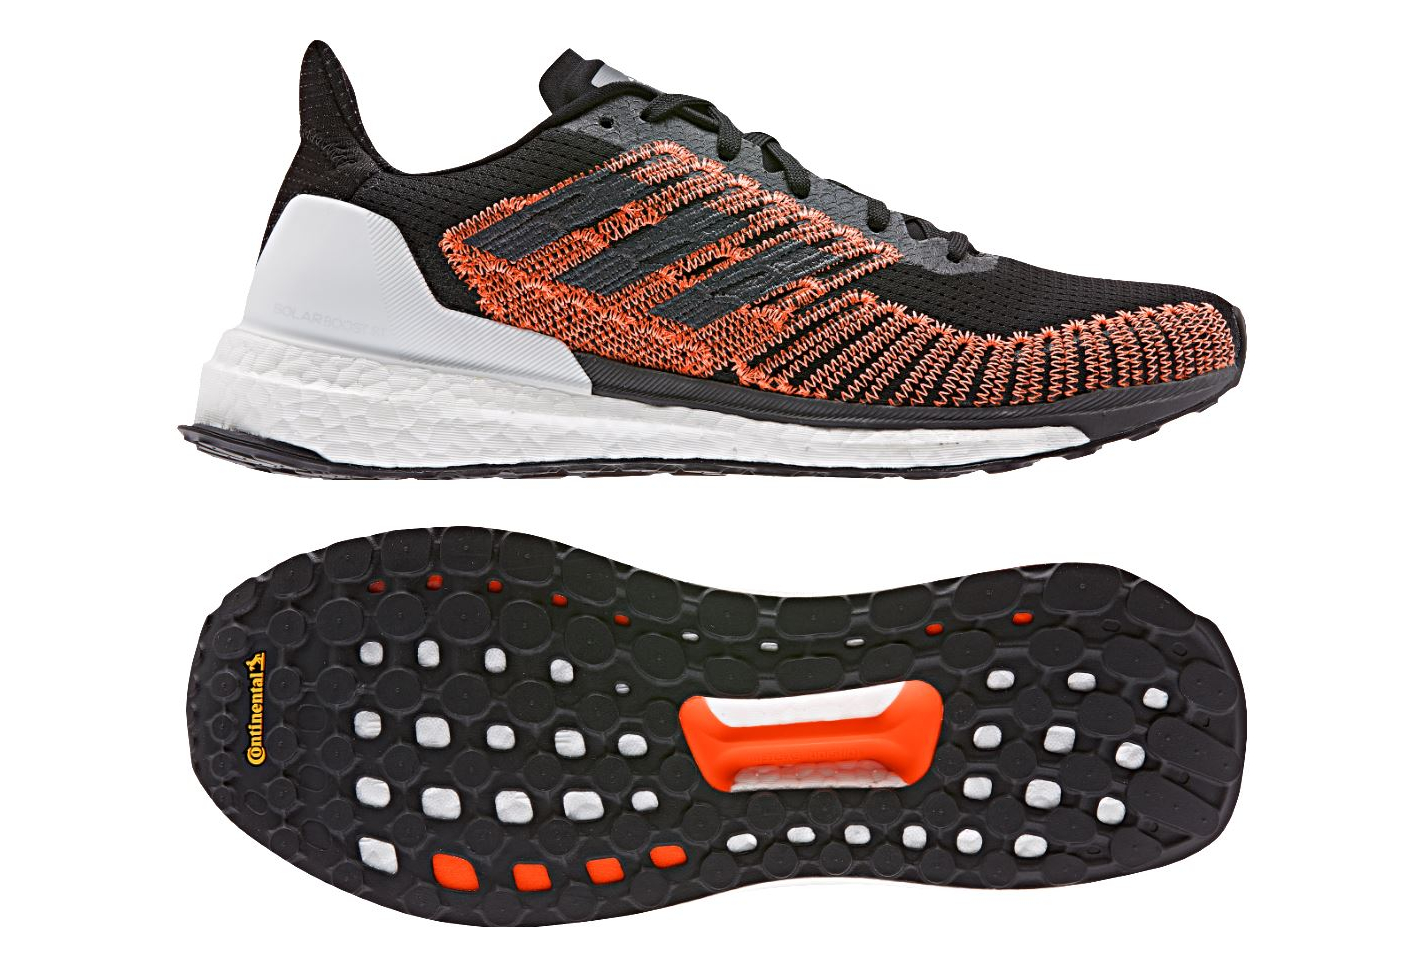 Noir Adidas Running Boost Chaussures Solar Orange De mNOv8w0n